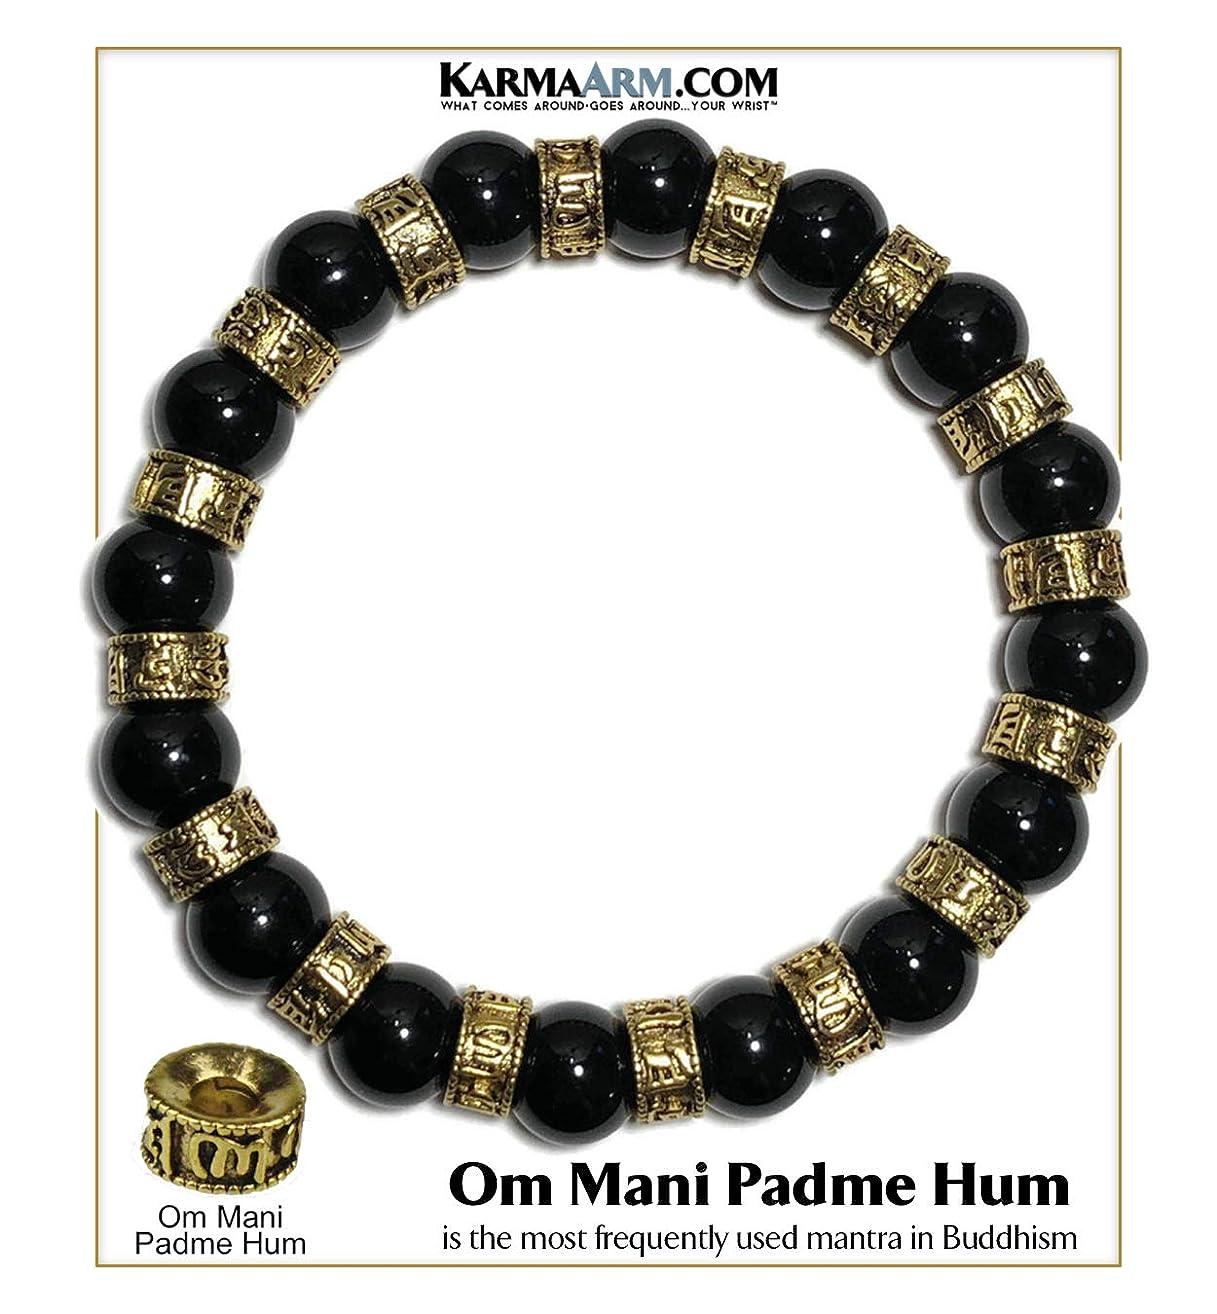 Tibetan Buddhist Mantra Prayer Wheels Bracelet   Om Mani Padme Hum   Yoga Chakra Bracelet   Boho Zen Meditation Self-Care Wellness Jewelry   10mm Black Onyx   Antiqued Gold